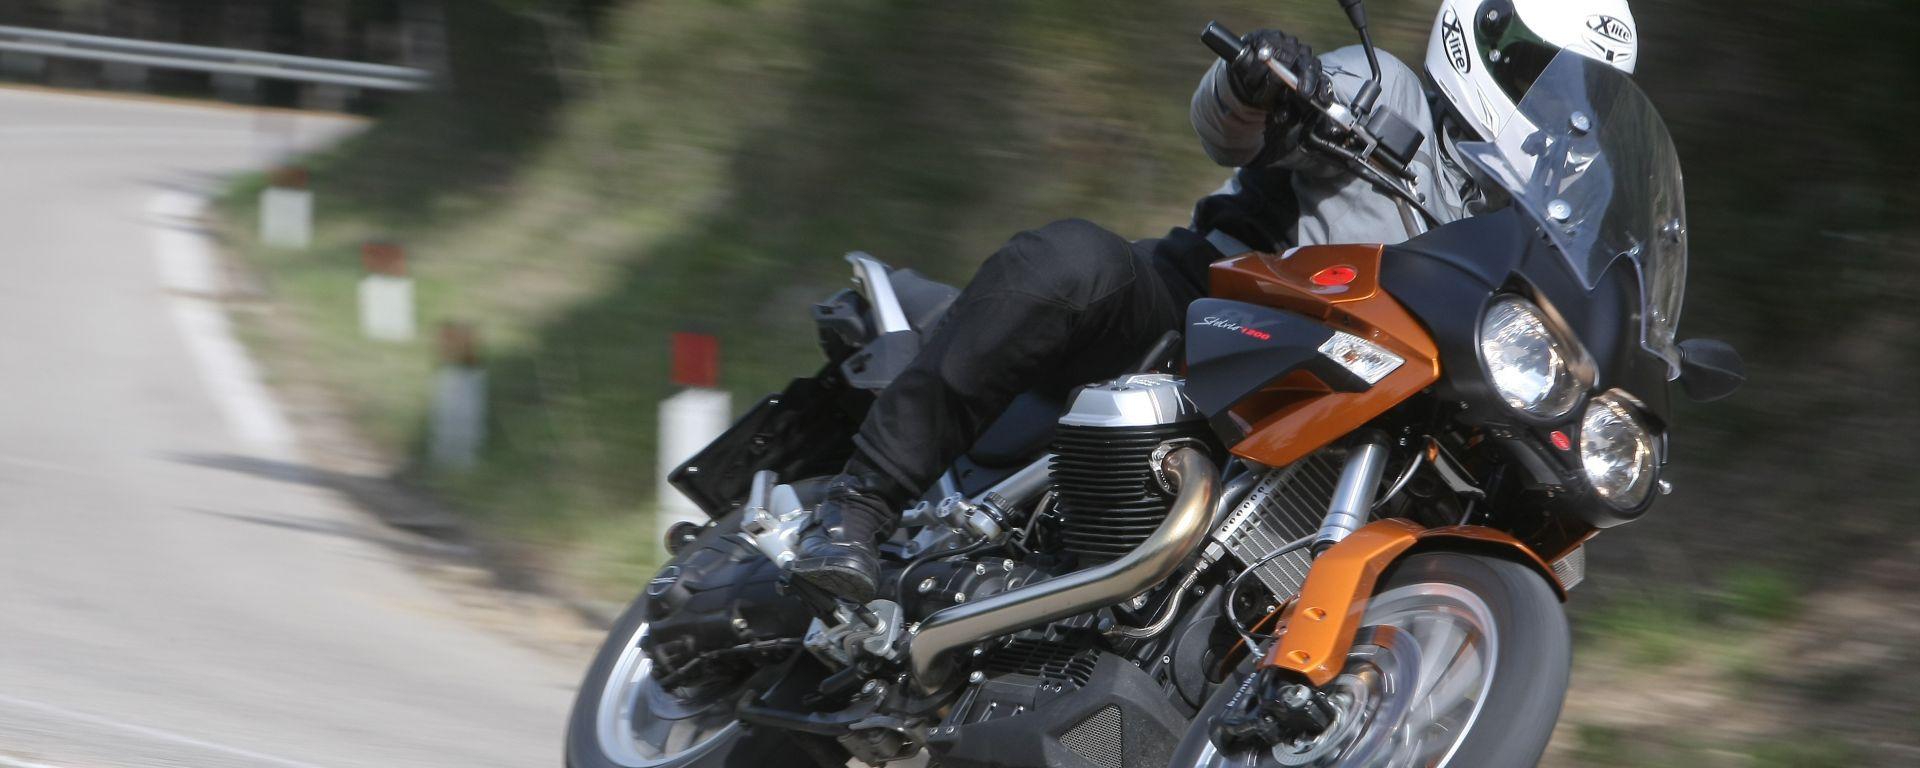 Moto Guzzi Stelvio 2011